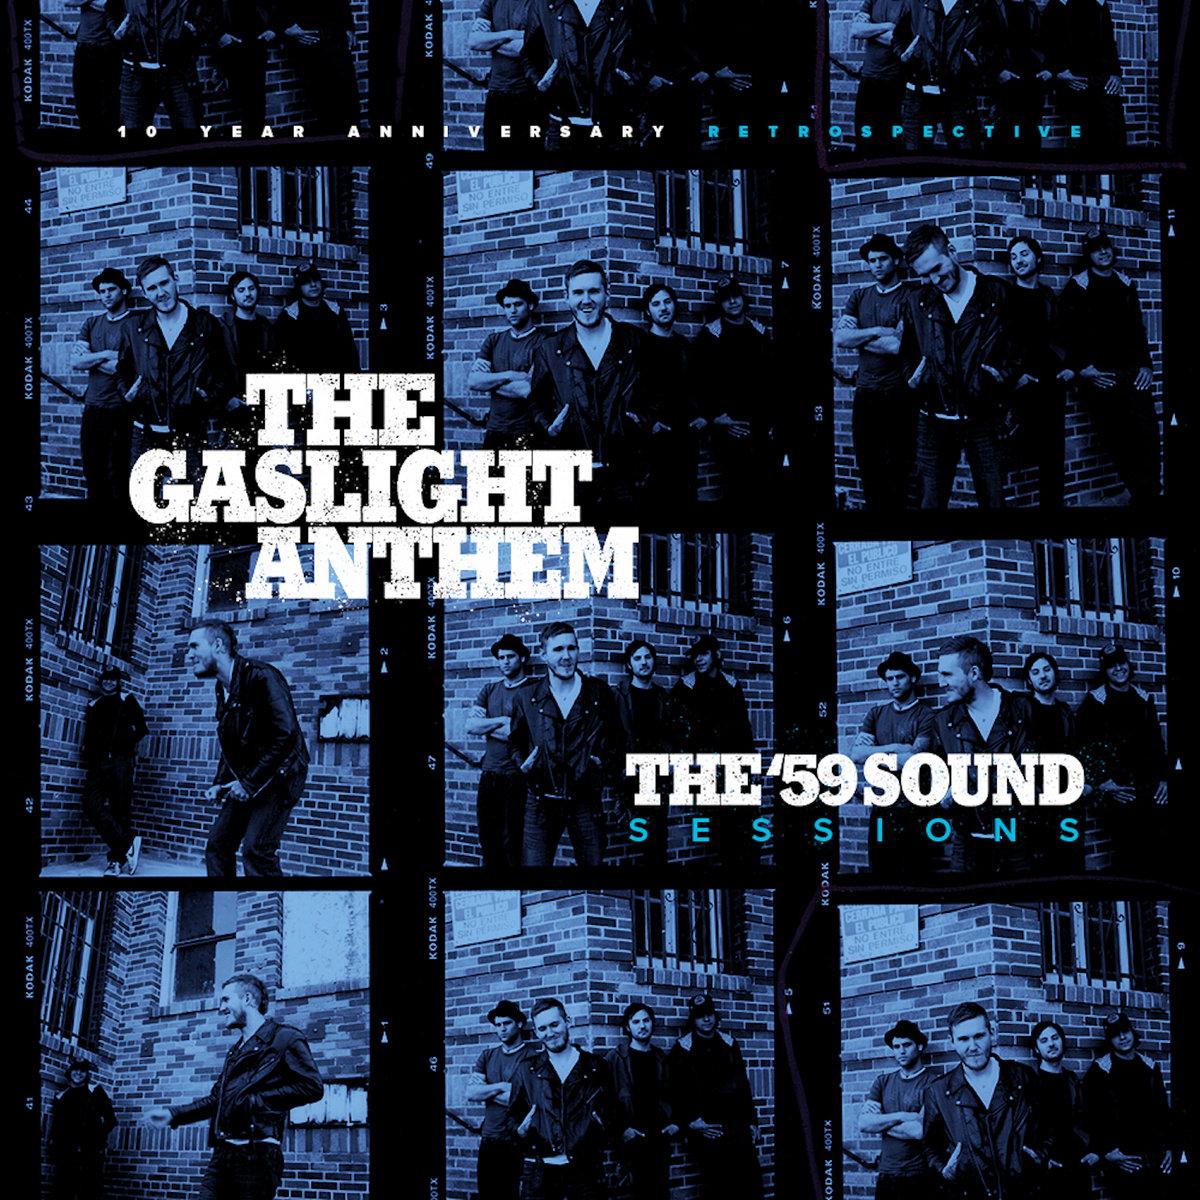 Gaslight anthem i don't Hook up lyrics